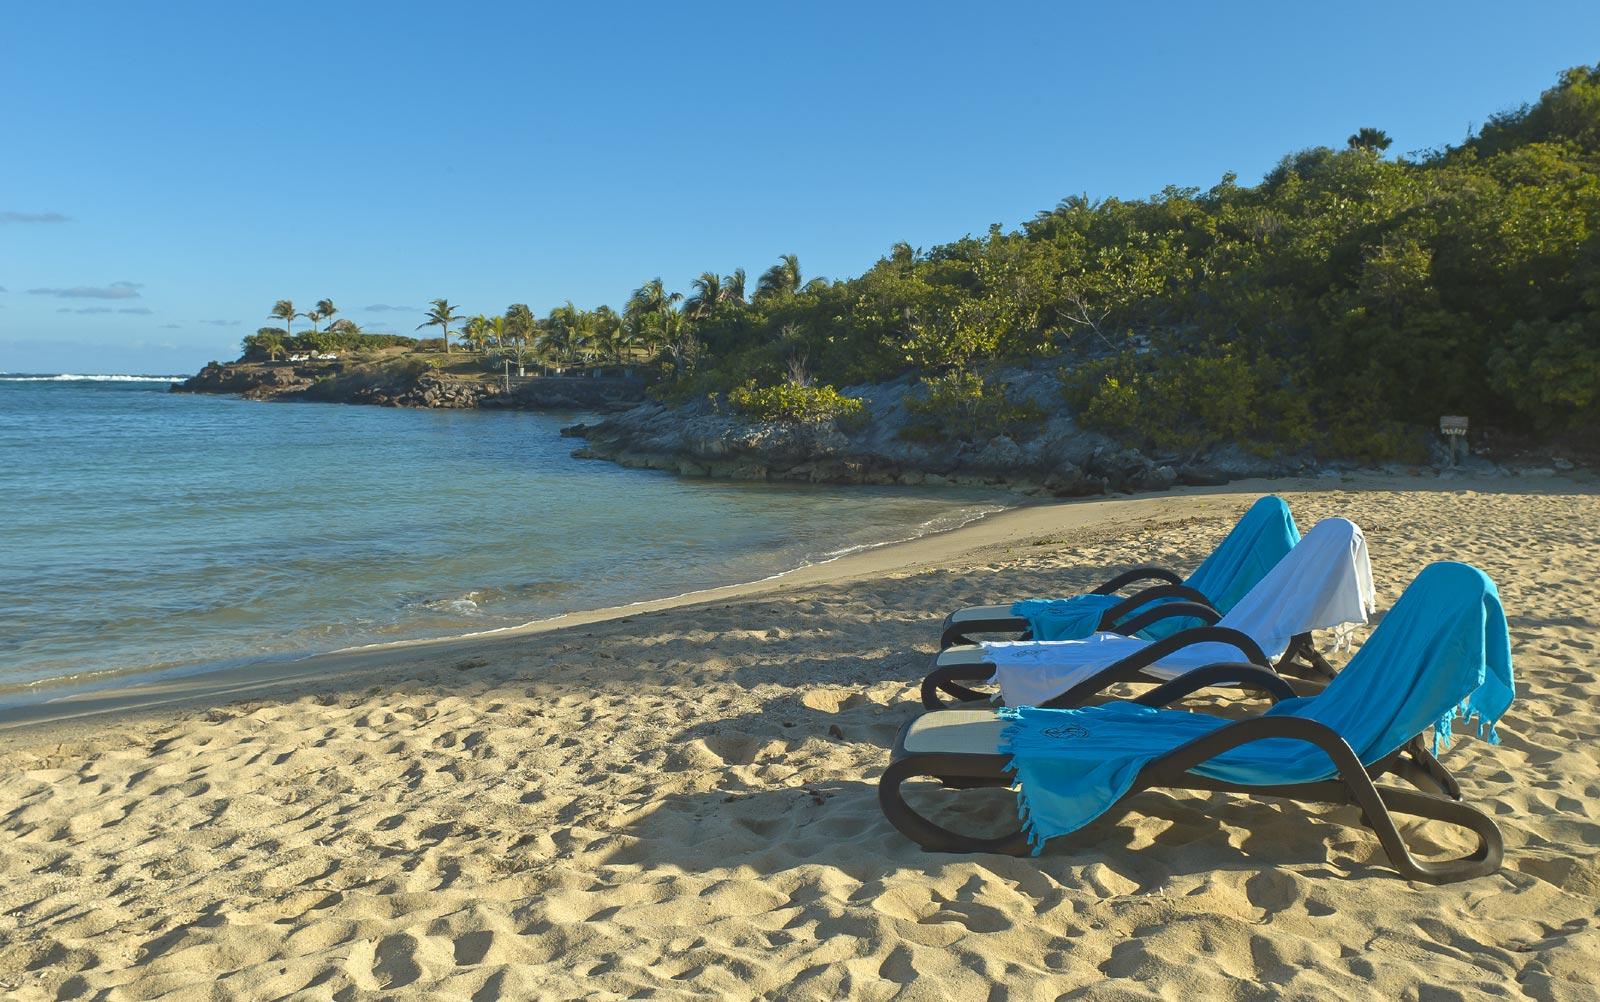 An almost perfect crescent of sandy beach at Petit Cul de Sac, St. Barths, Caribbean.